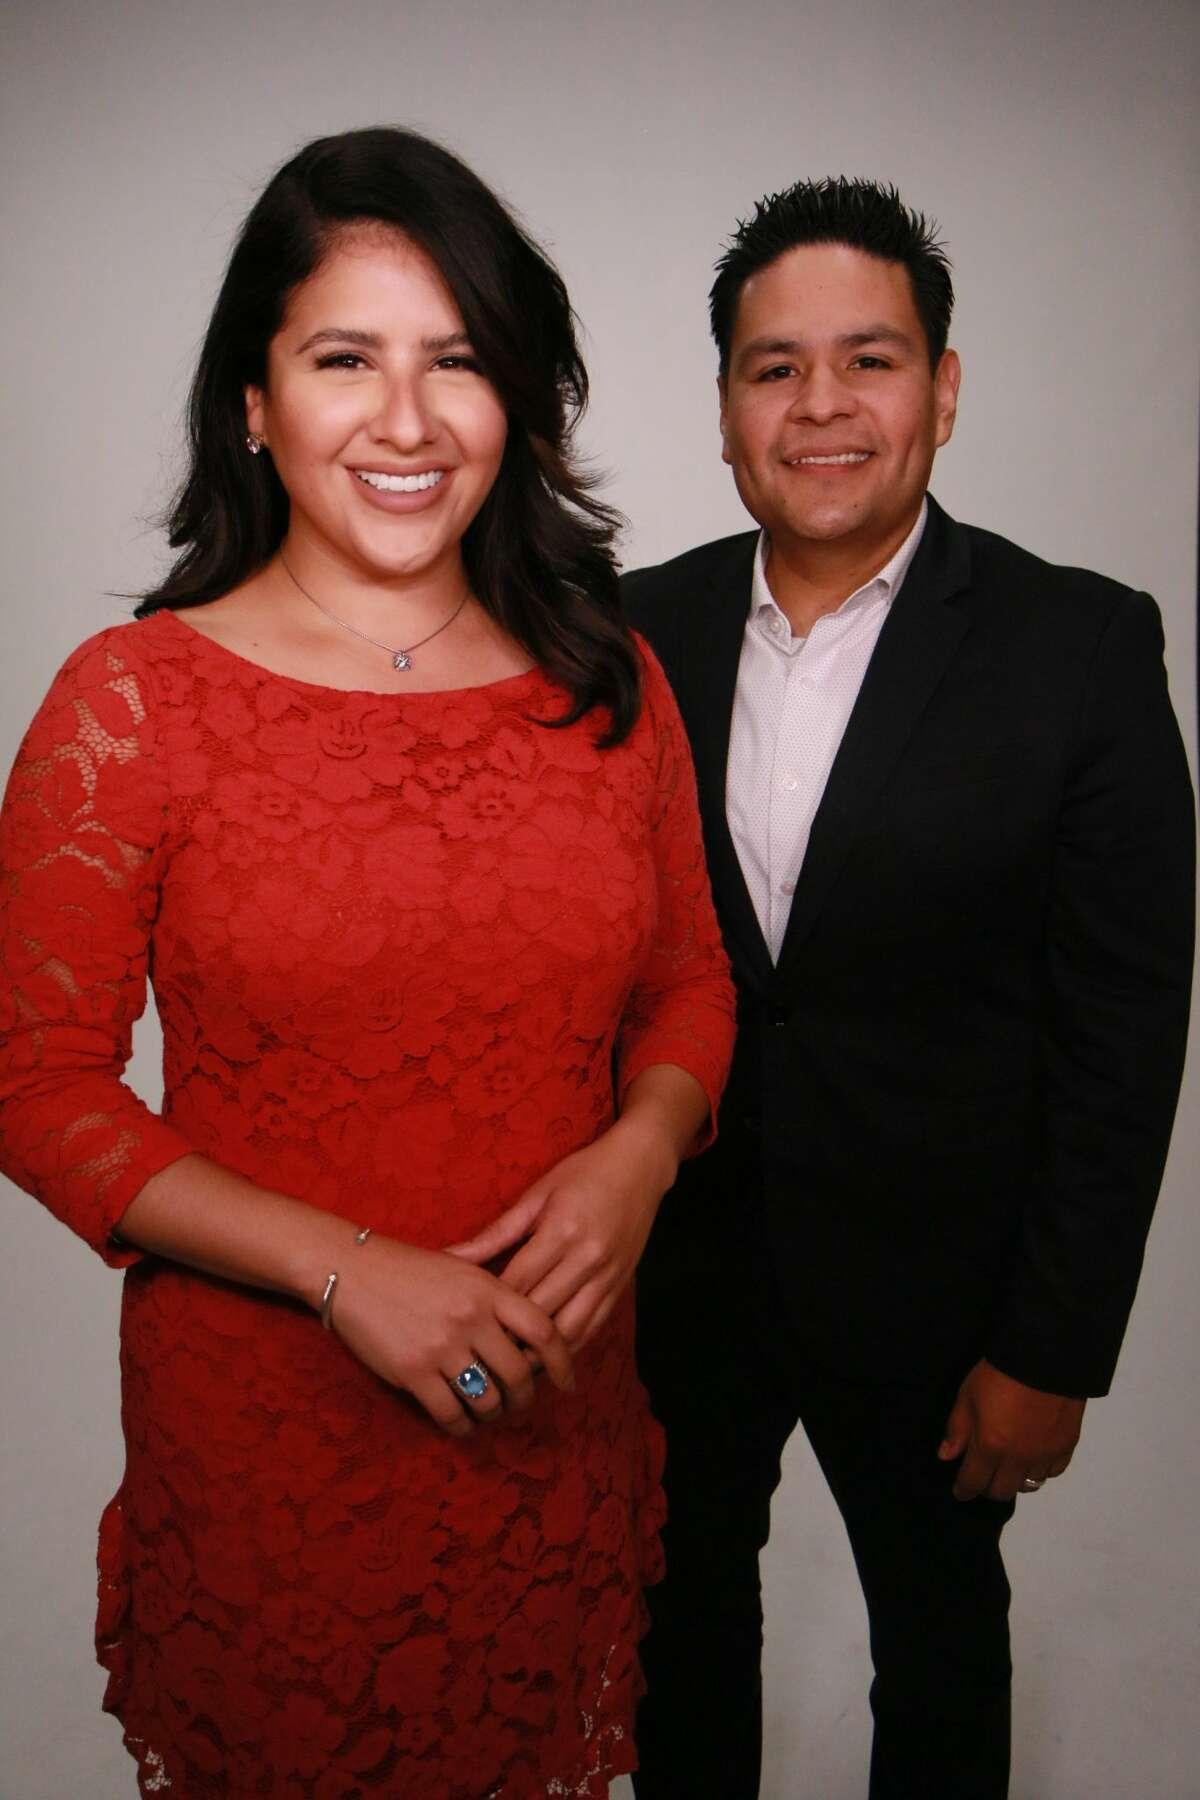 Alicia Barrera and RJ Marquez will host KSAT News Now.